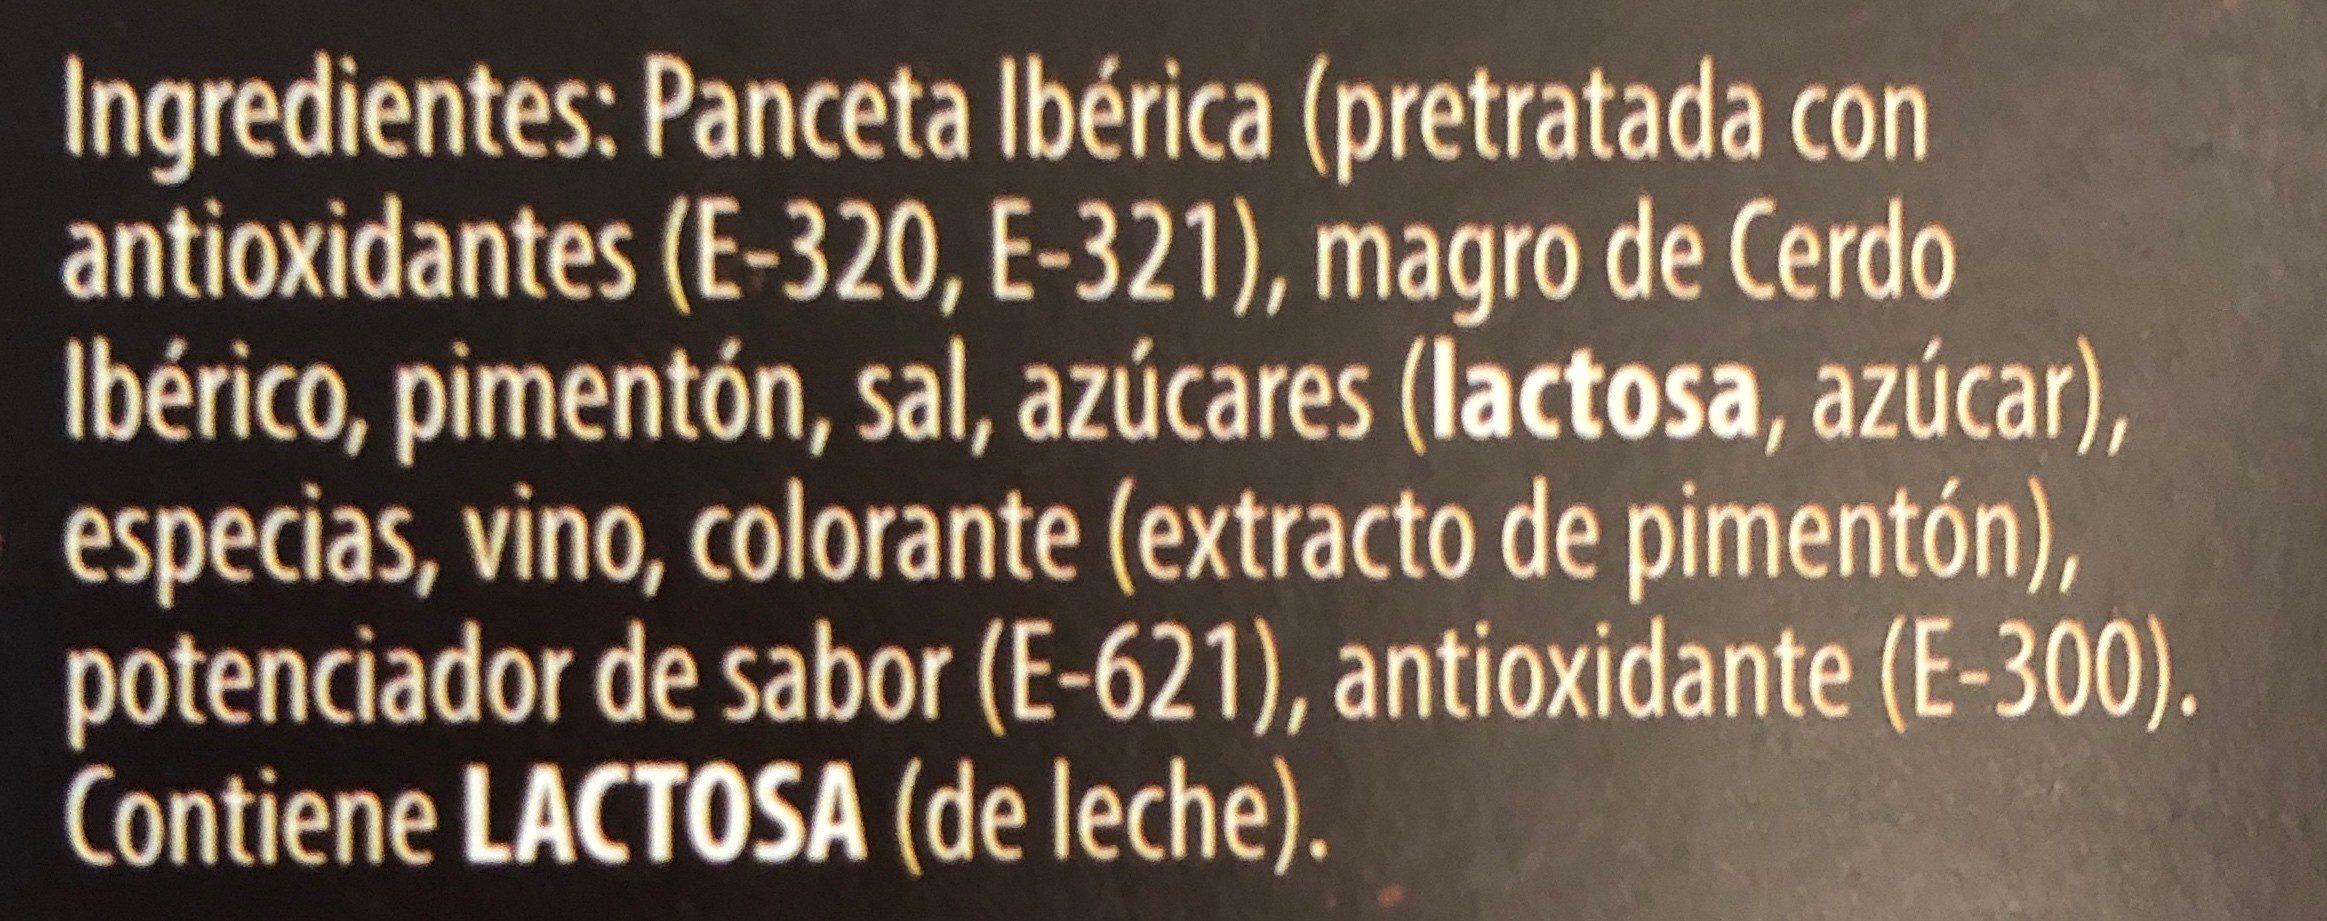 Sobrasada Iberica Cuyar Untar - Ingredientes